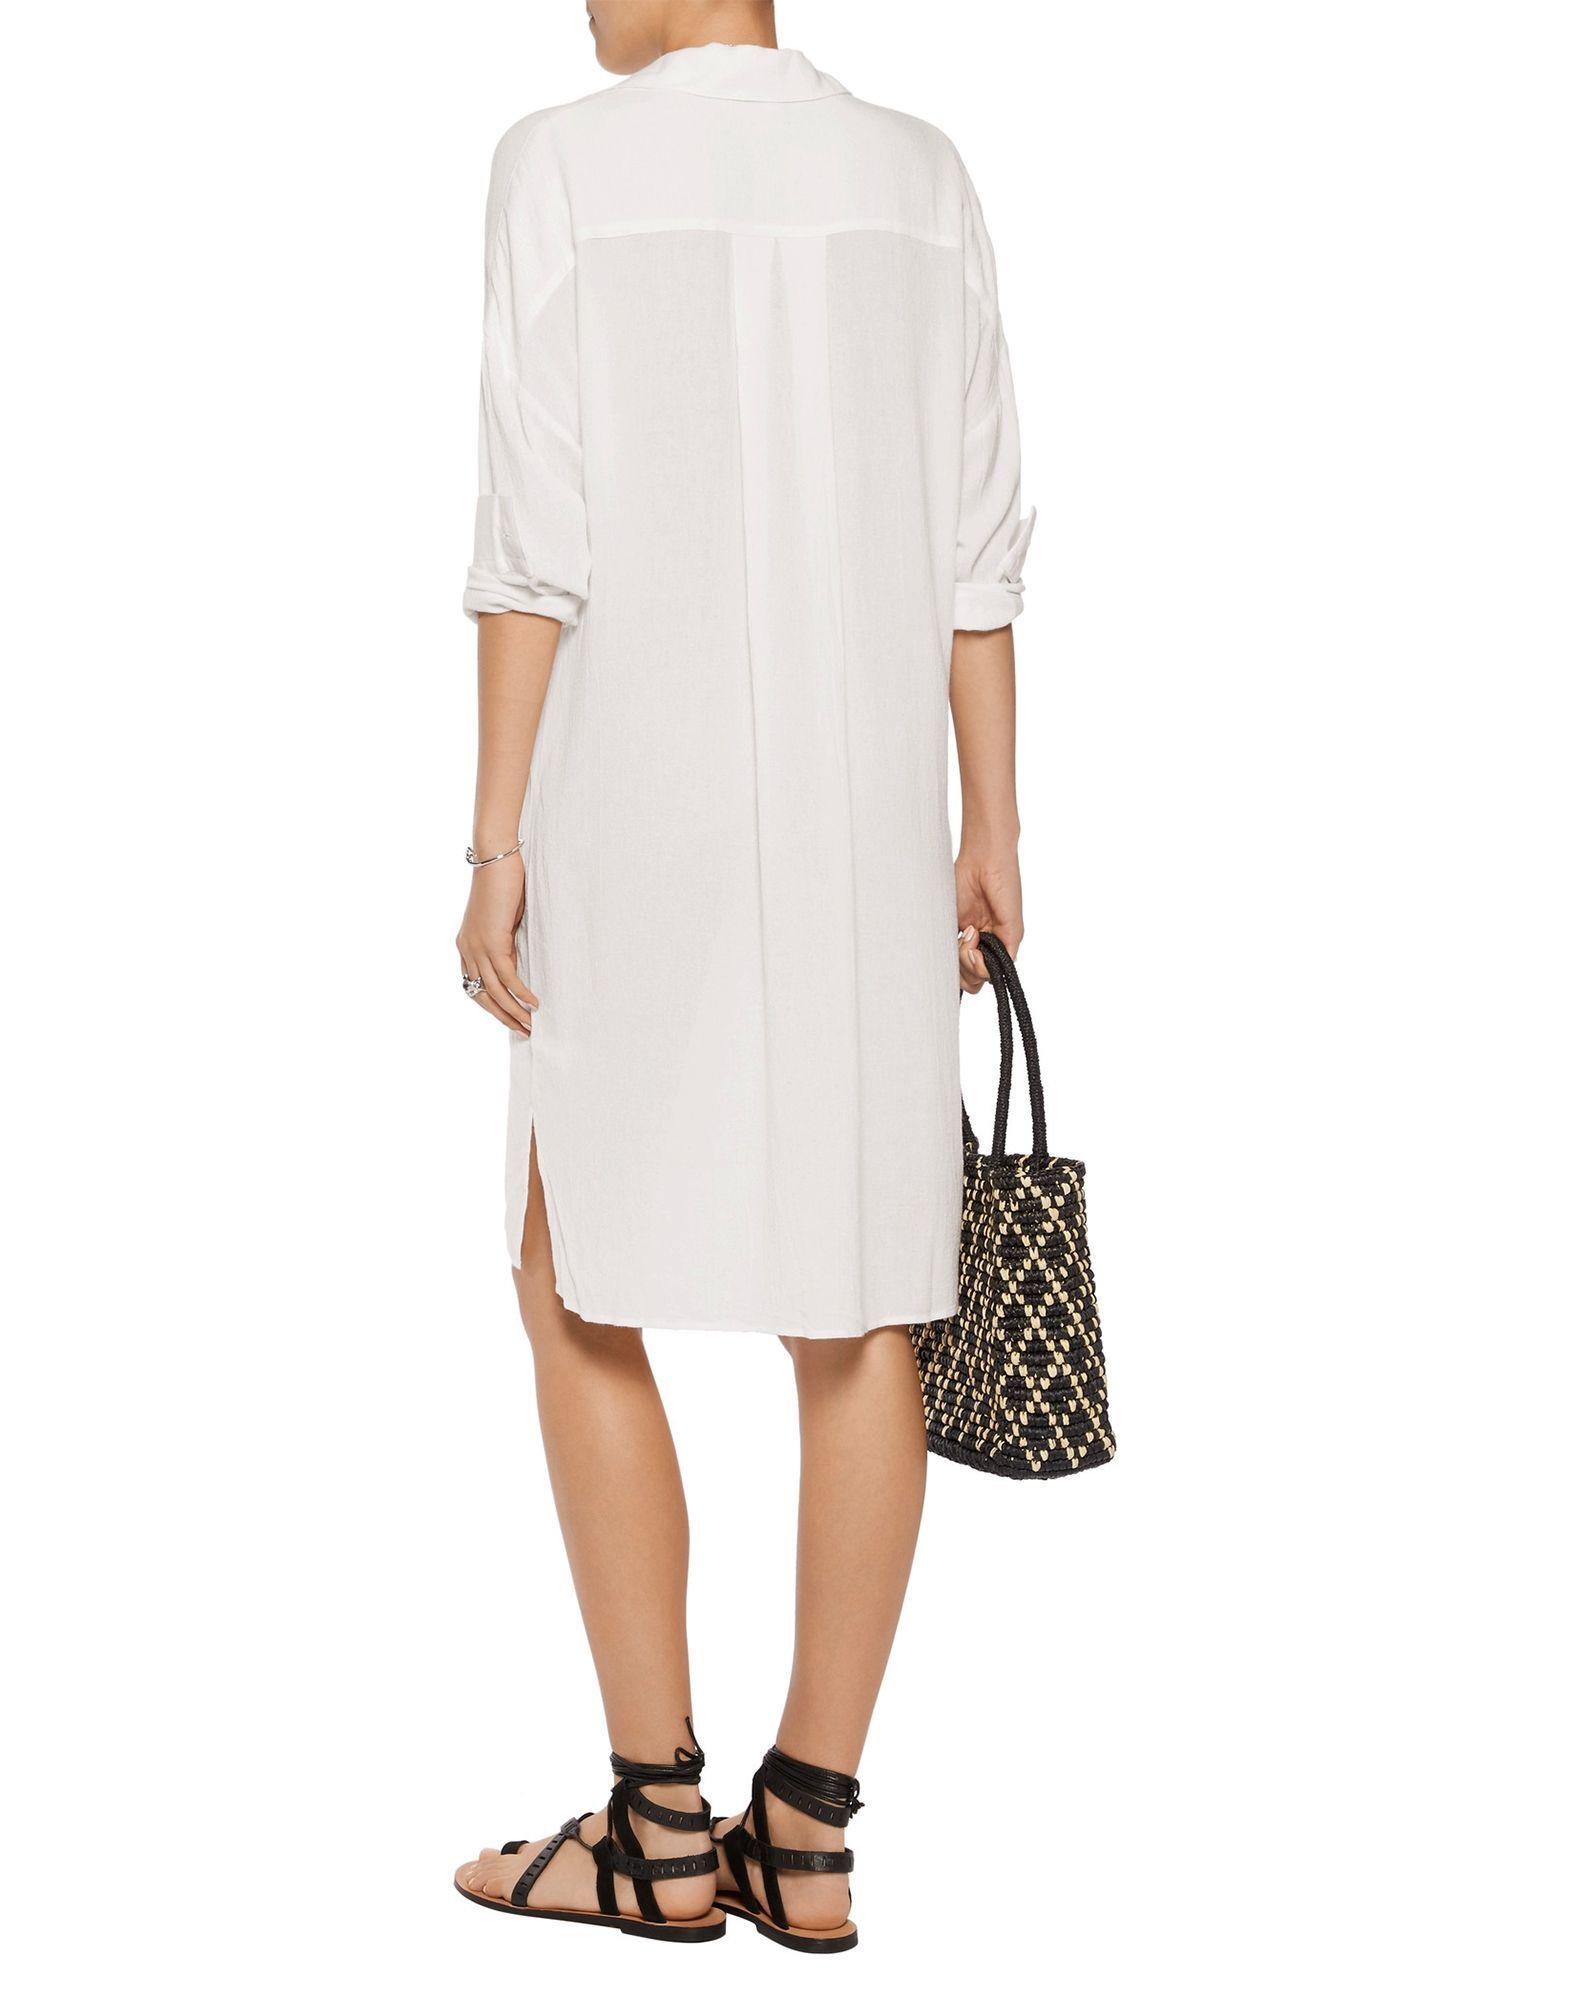 James Perse Ivory Long Sleeve Dress